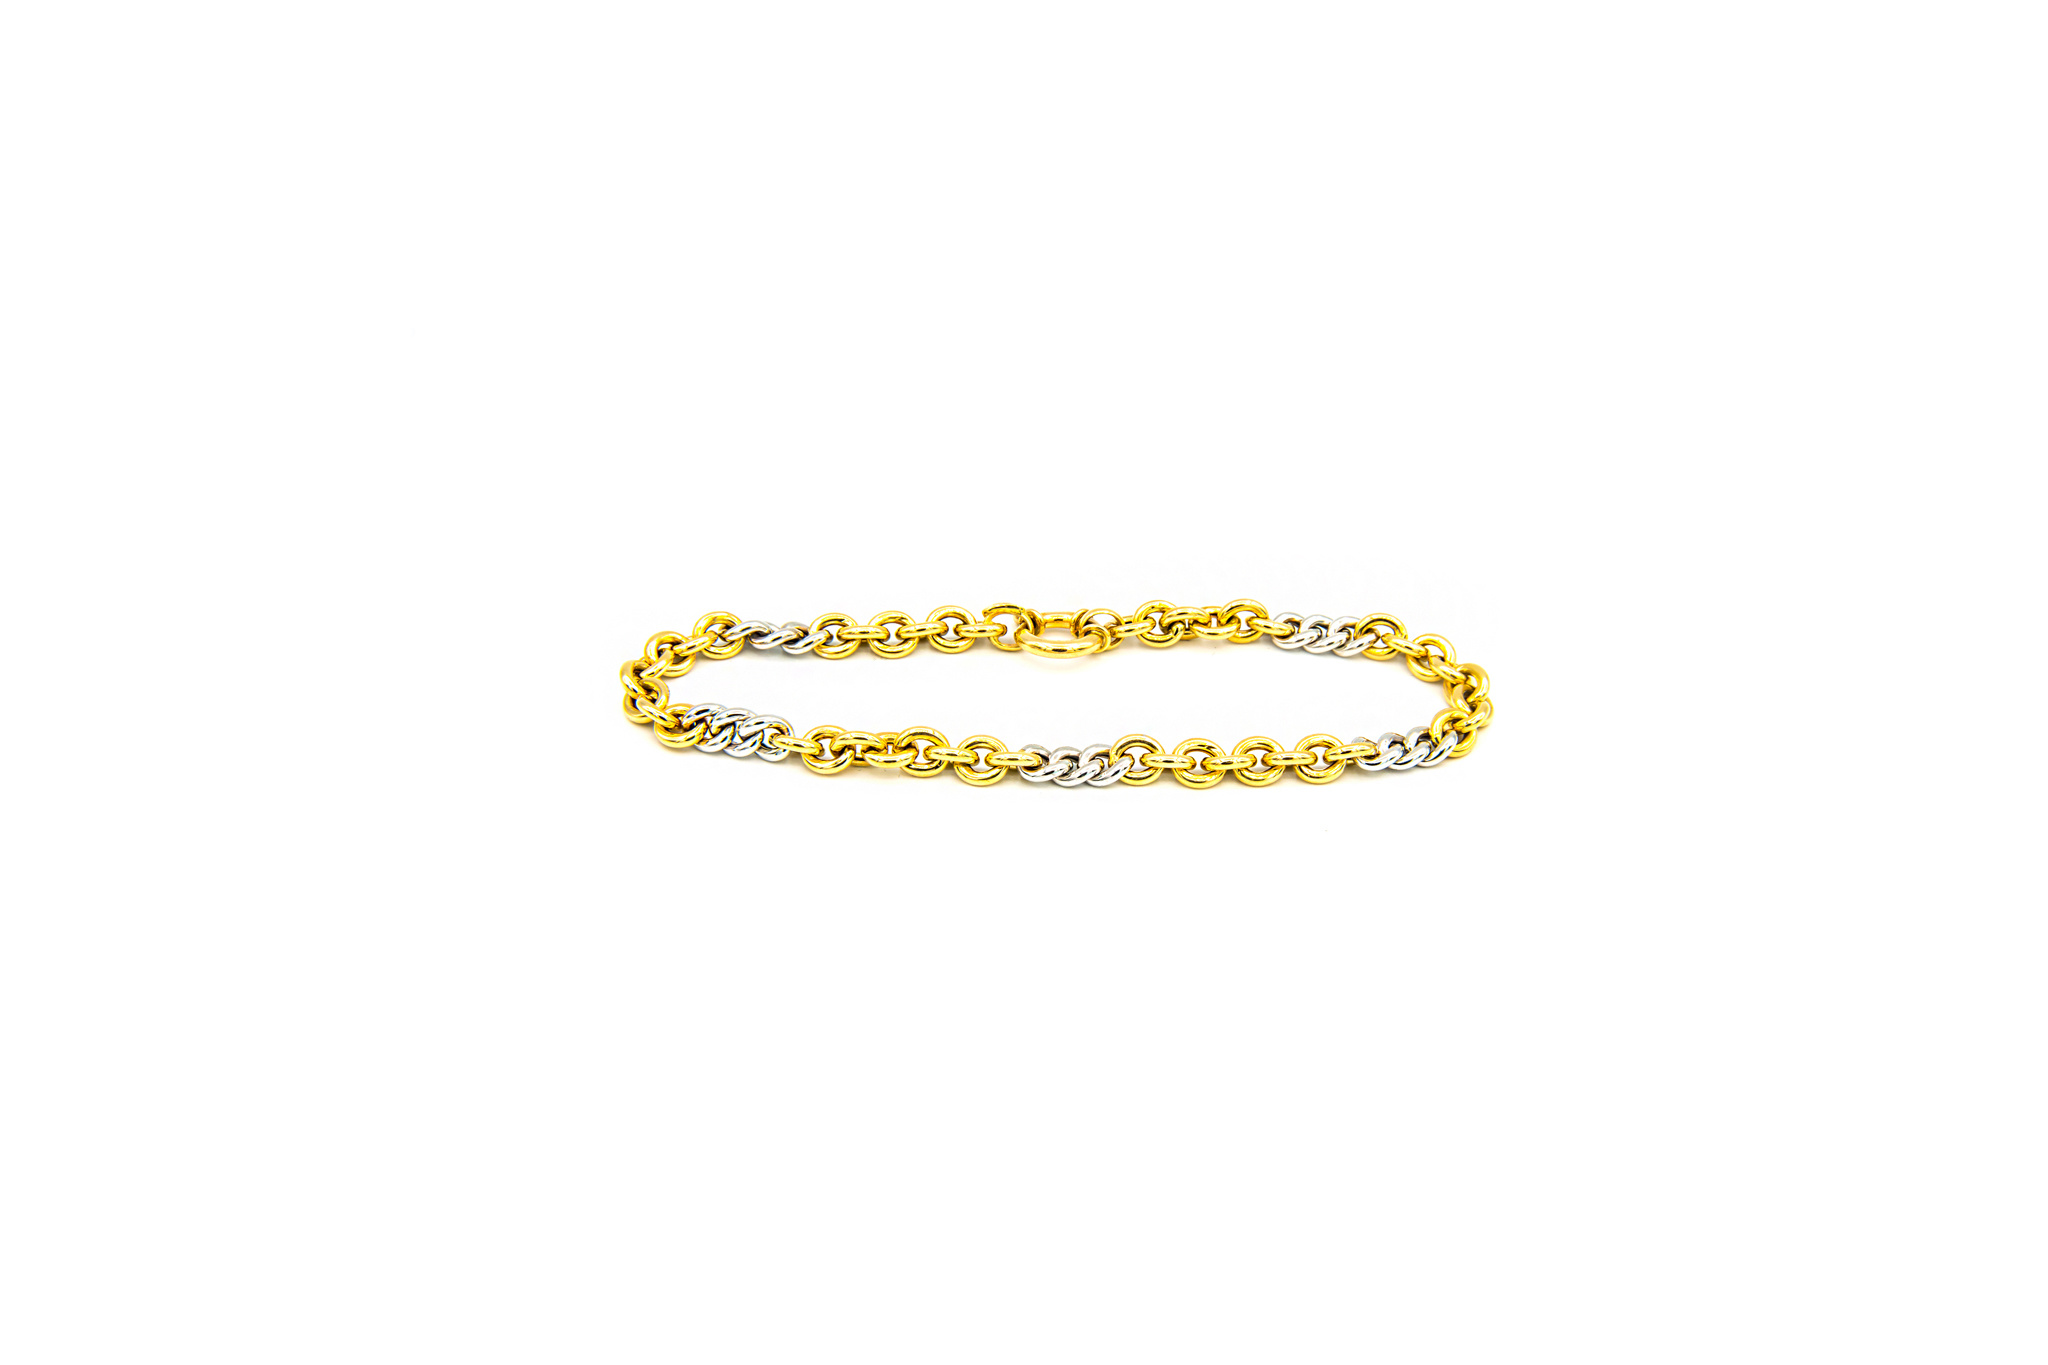 Armband anker-gourmet bicolor-1